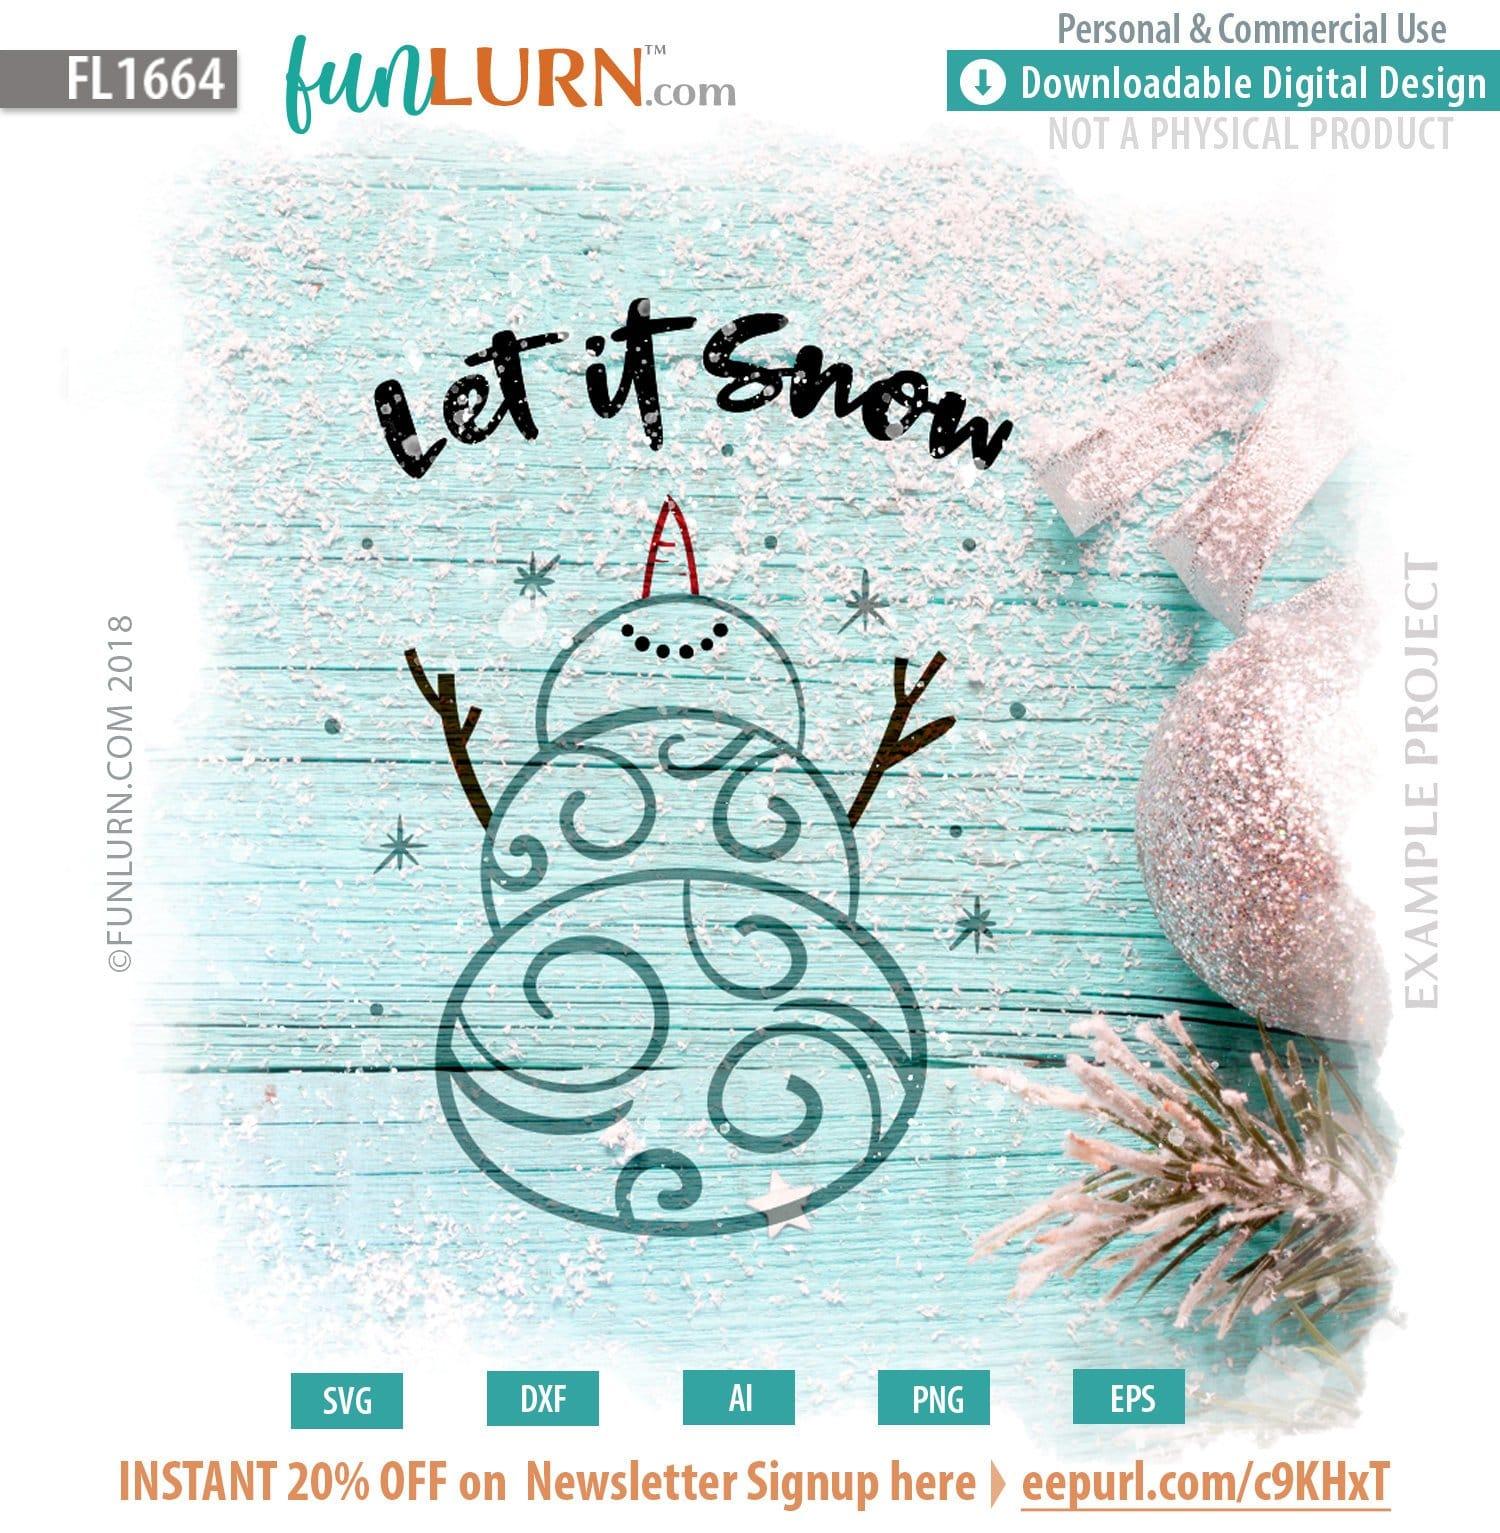 Let It Snow Svg Swirly Snowman Funlurn